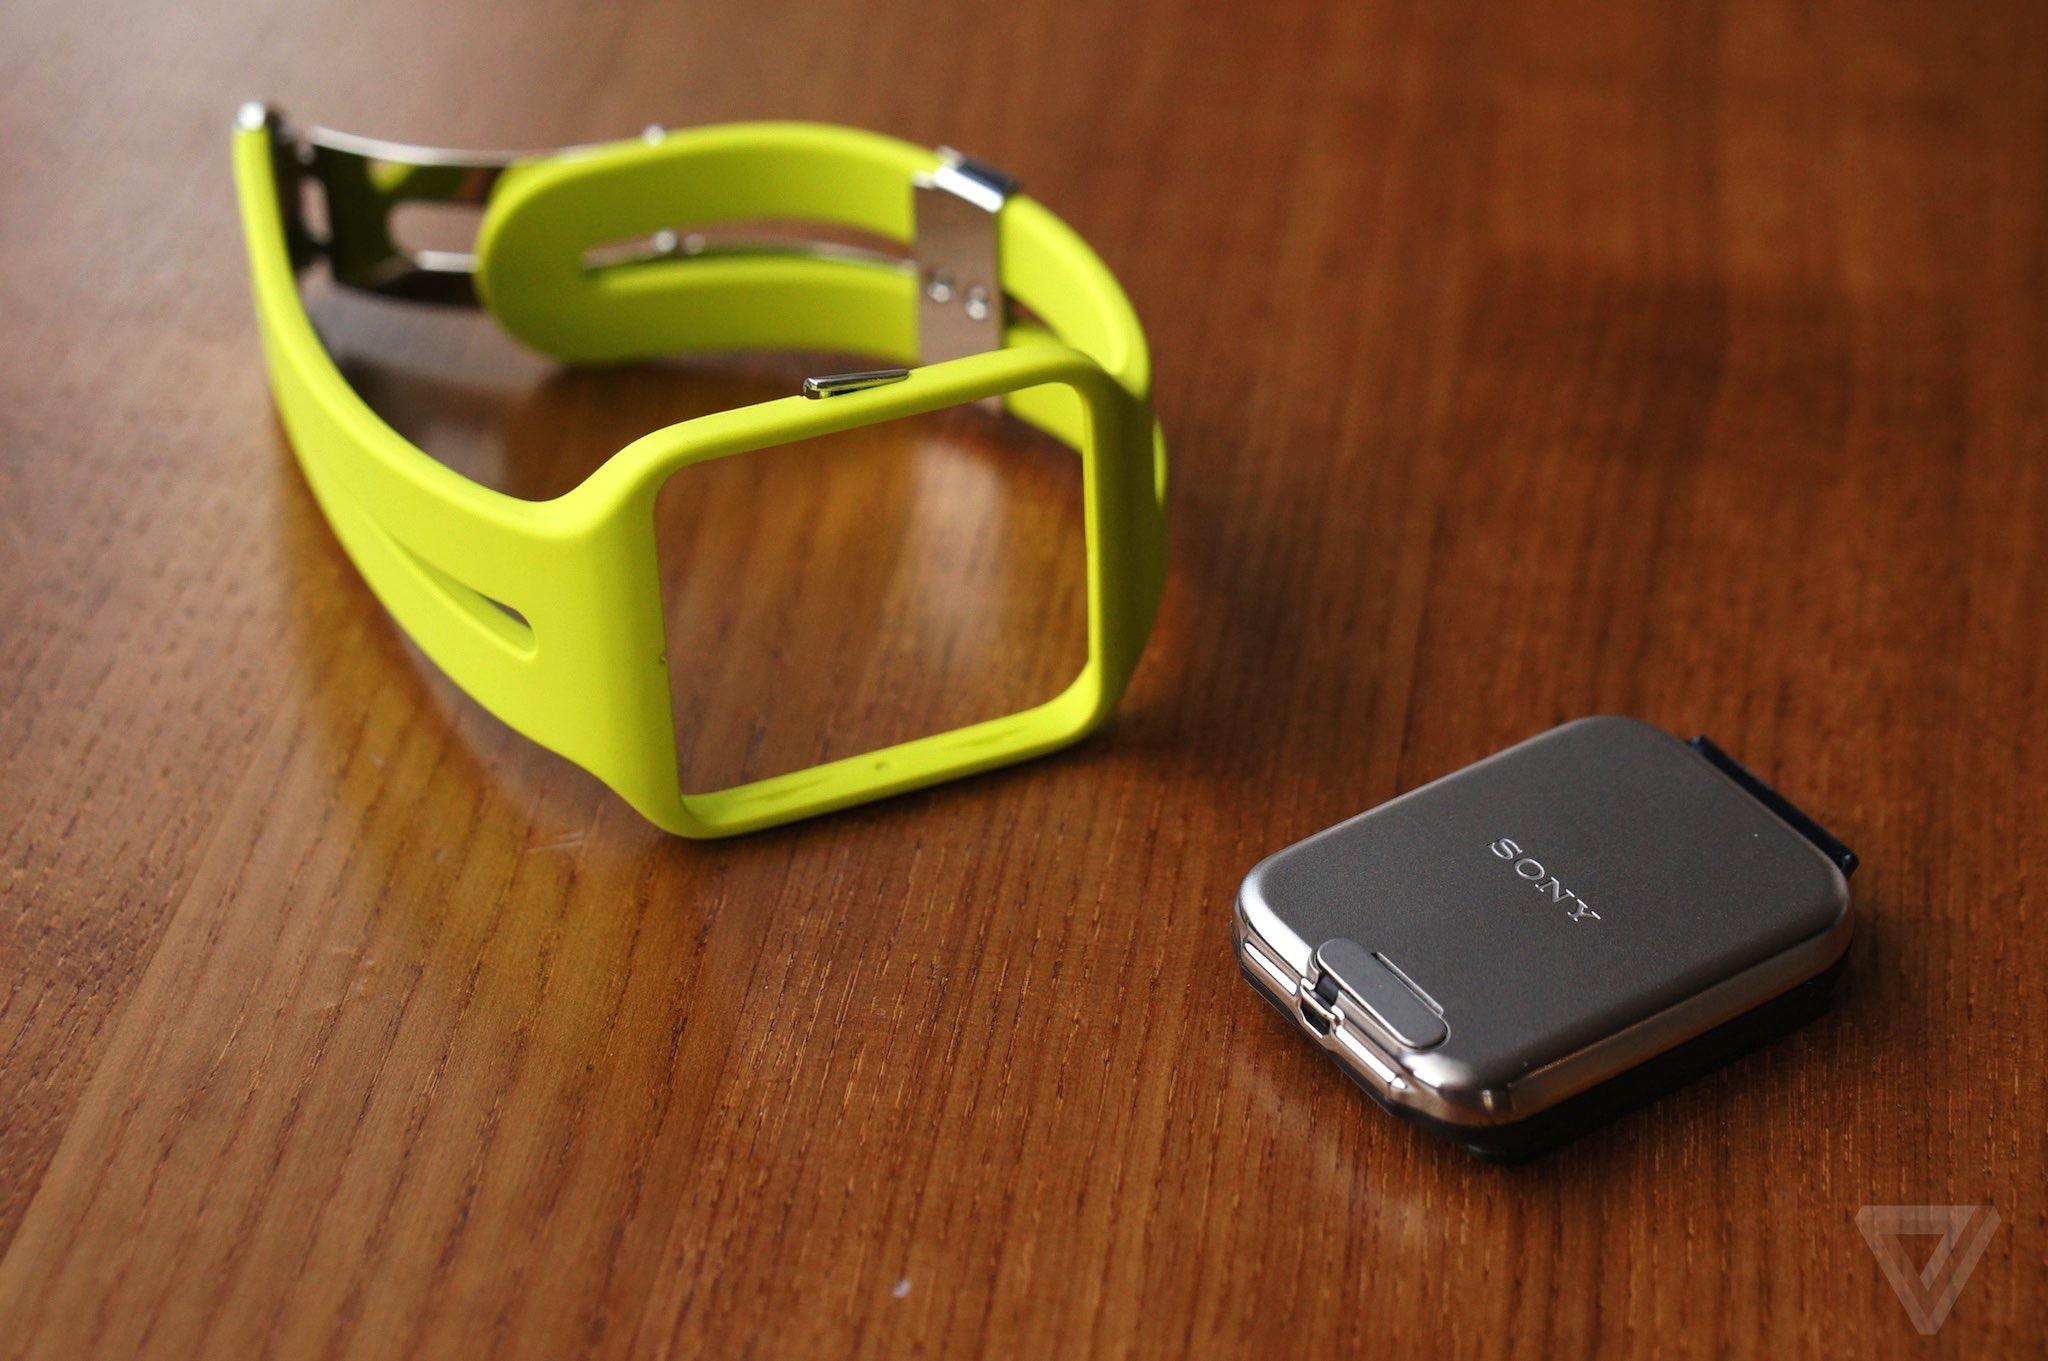 smartwatch sony the verge. Black Bedroom Furniture Sets. Home Design Ideas